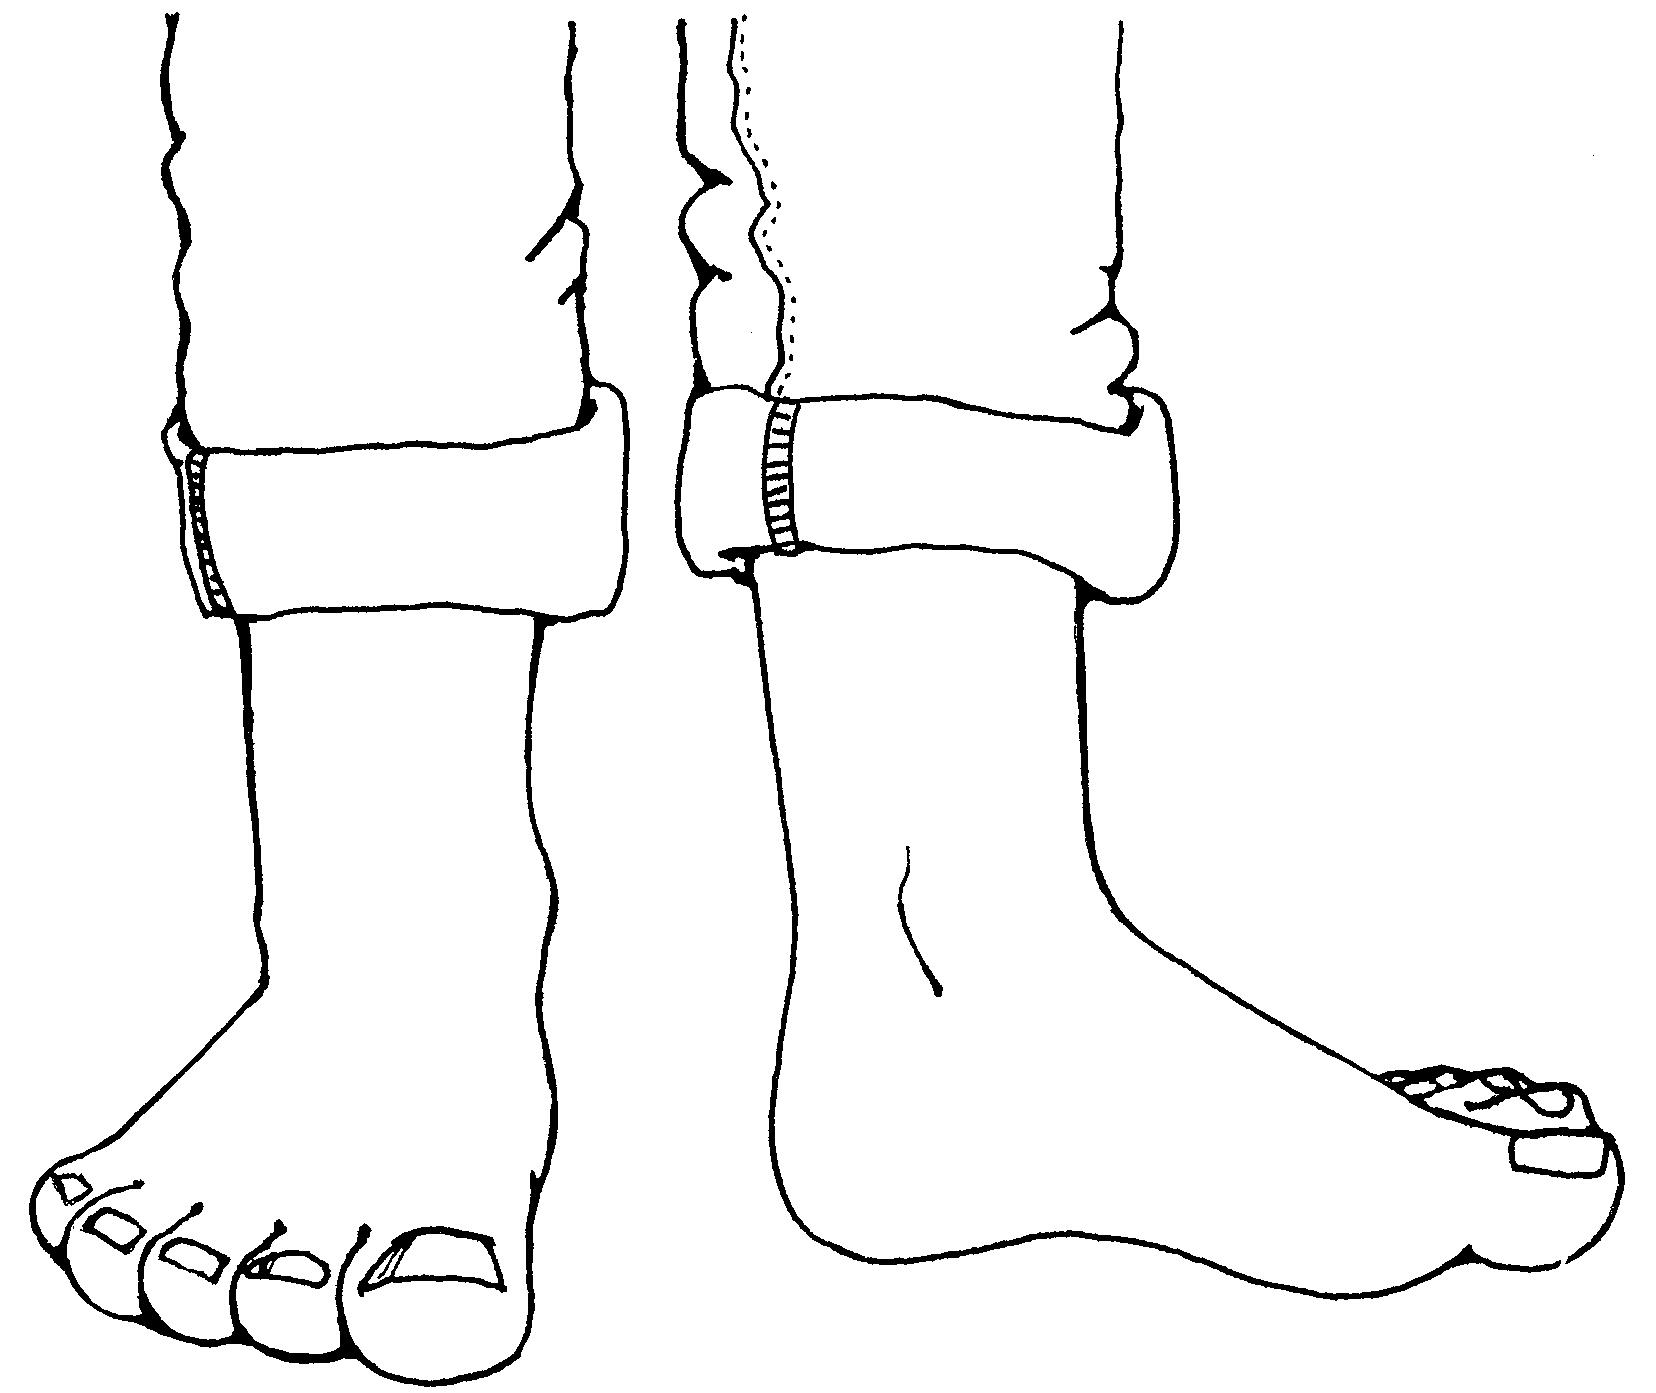 Legs clipart black and white Feet Clipartner Images Feet &